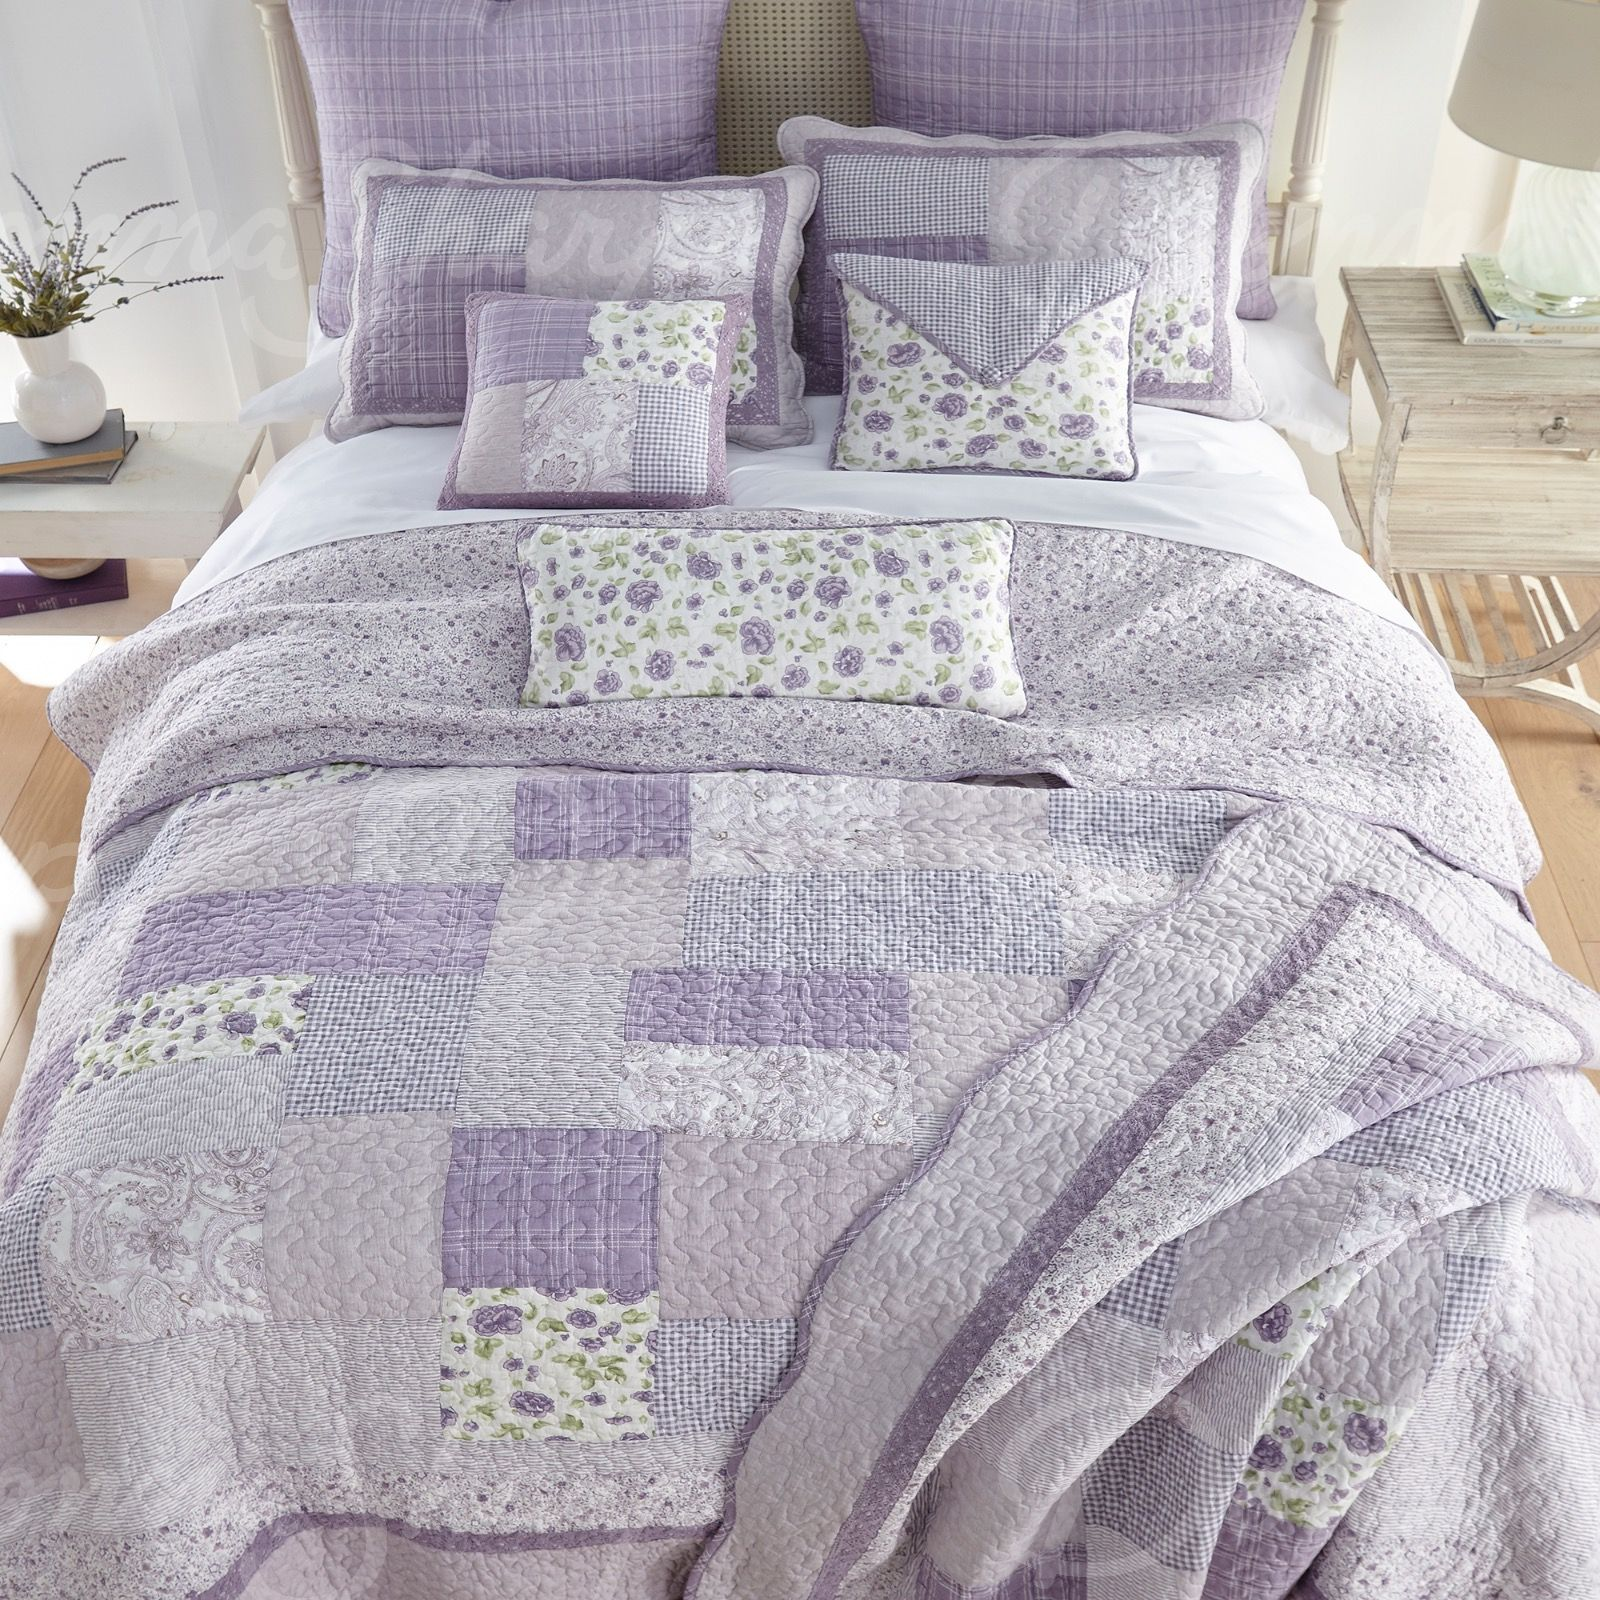 Lavender Rose Patchwork Quilt By Donna Sharp